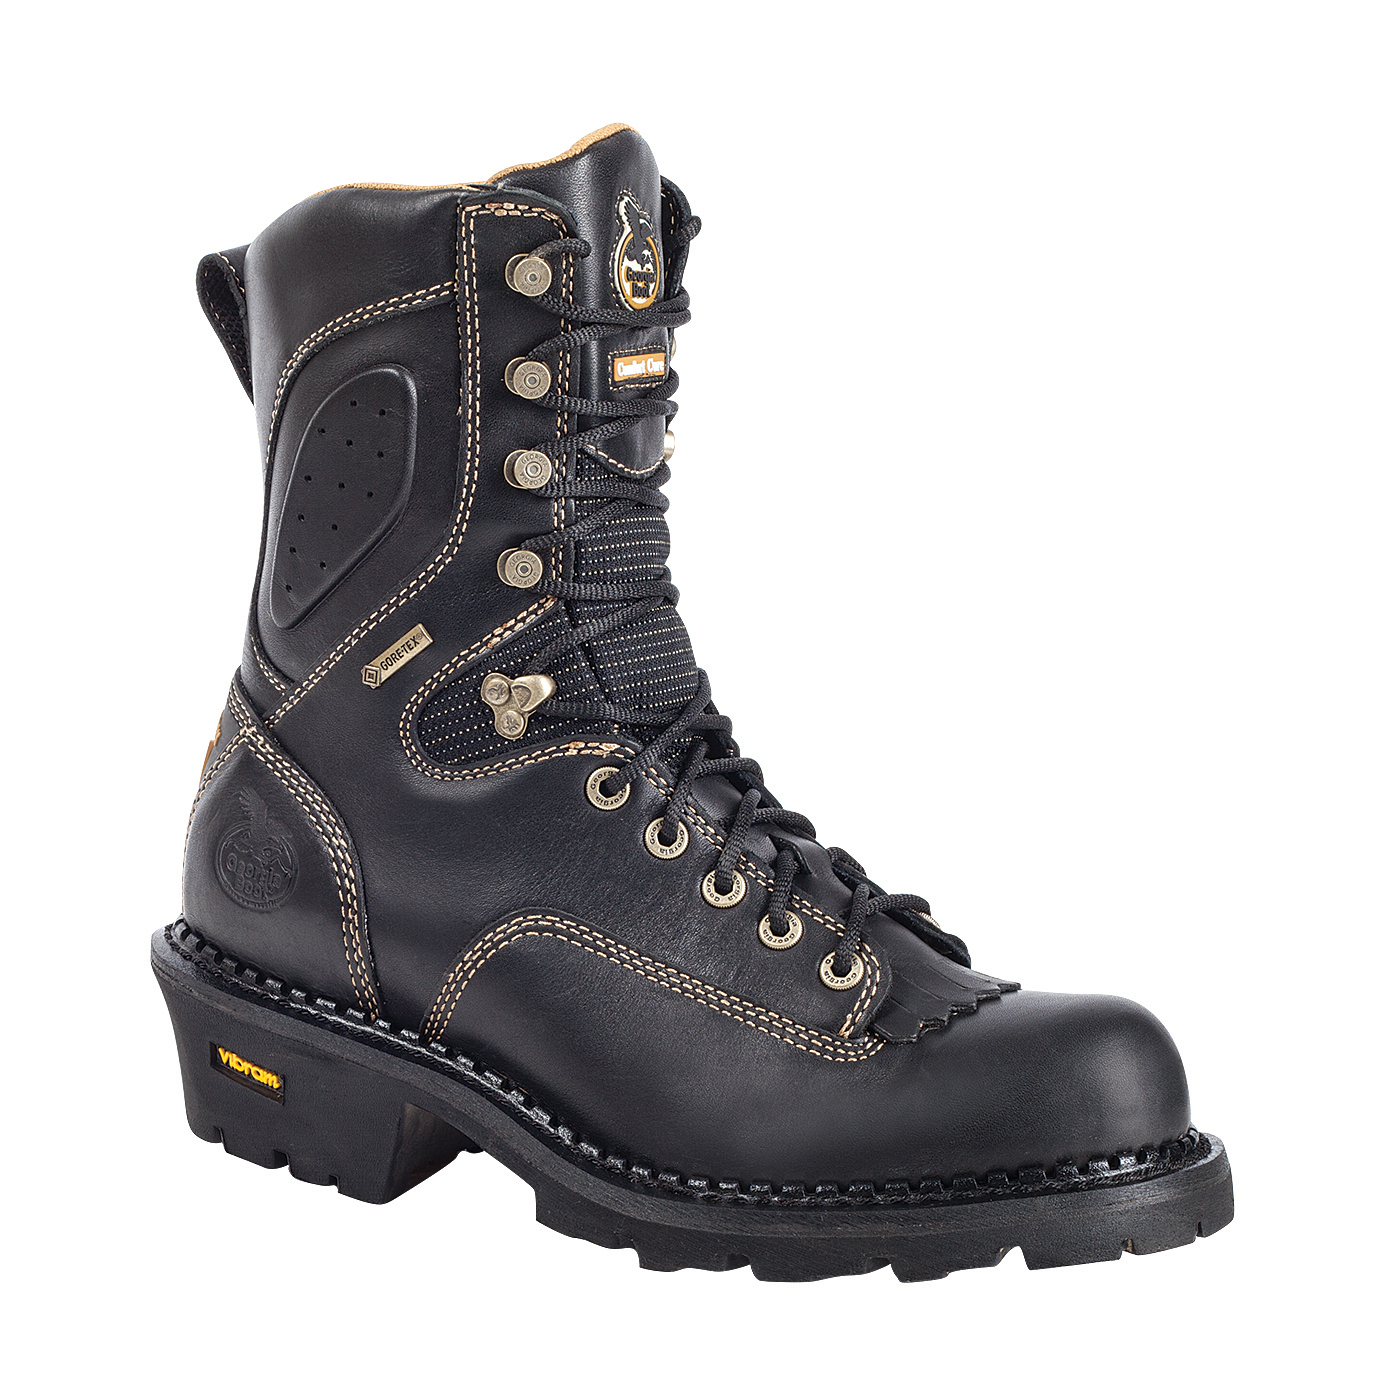 Georgia Boot Boot G033 GORE-TEX Comfort Core Logger Work Boot at Sears.com